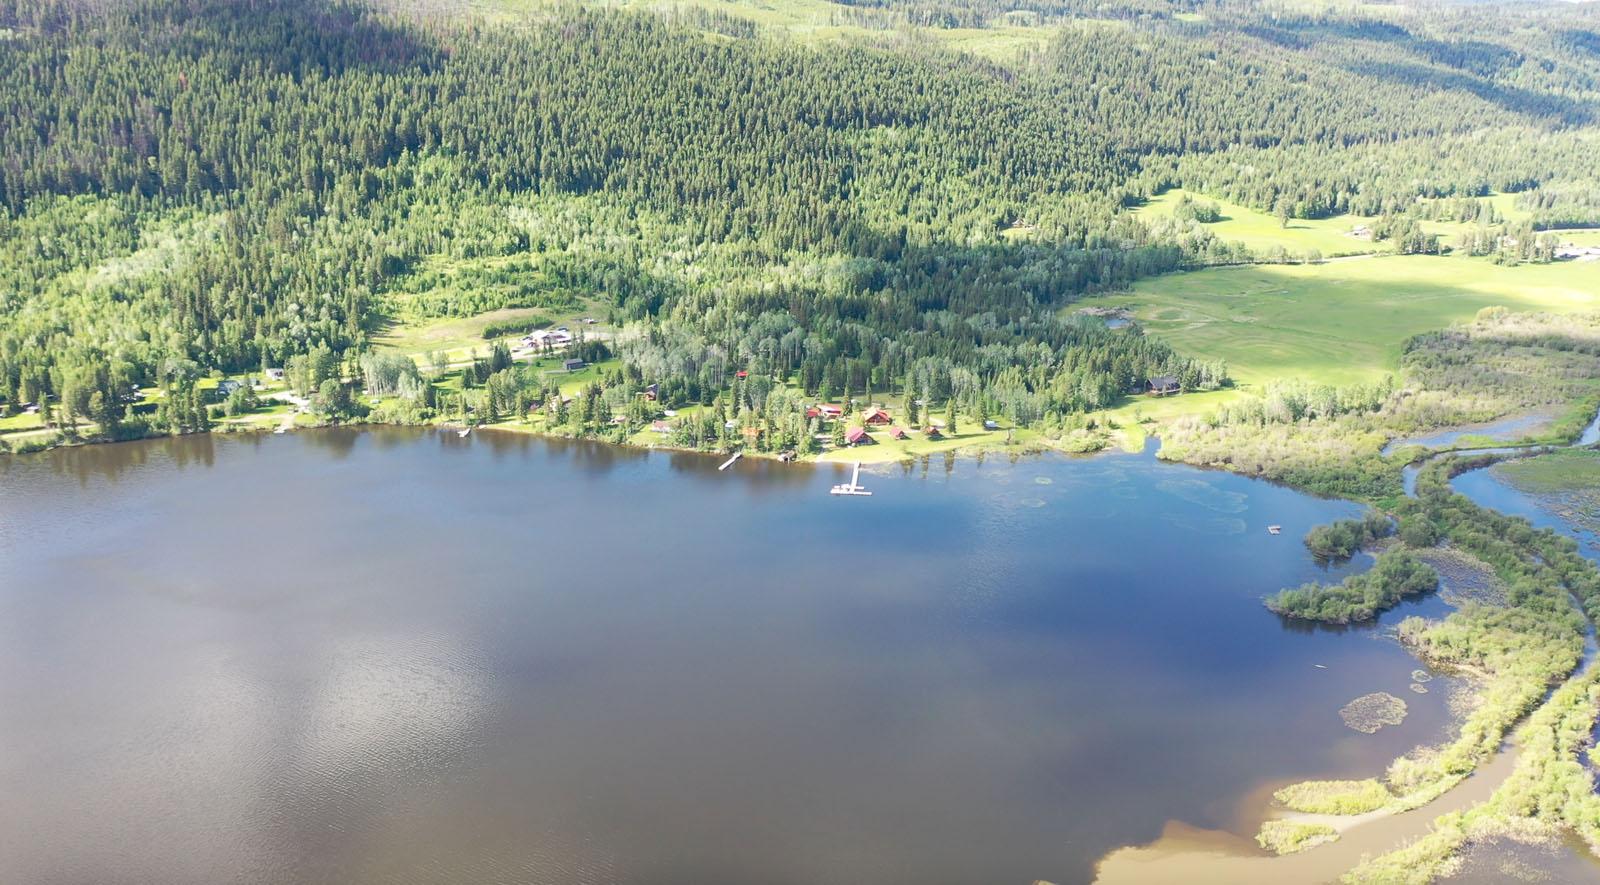 Canim lake resort 03